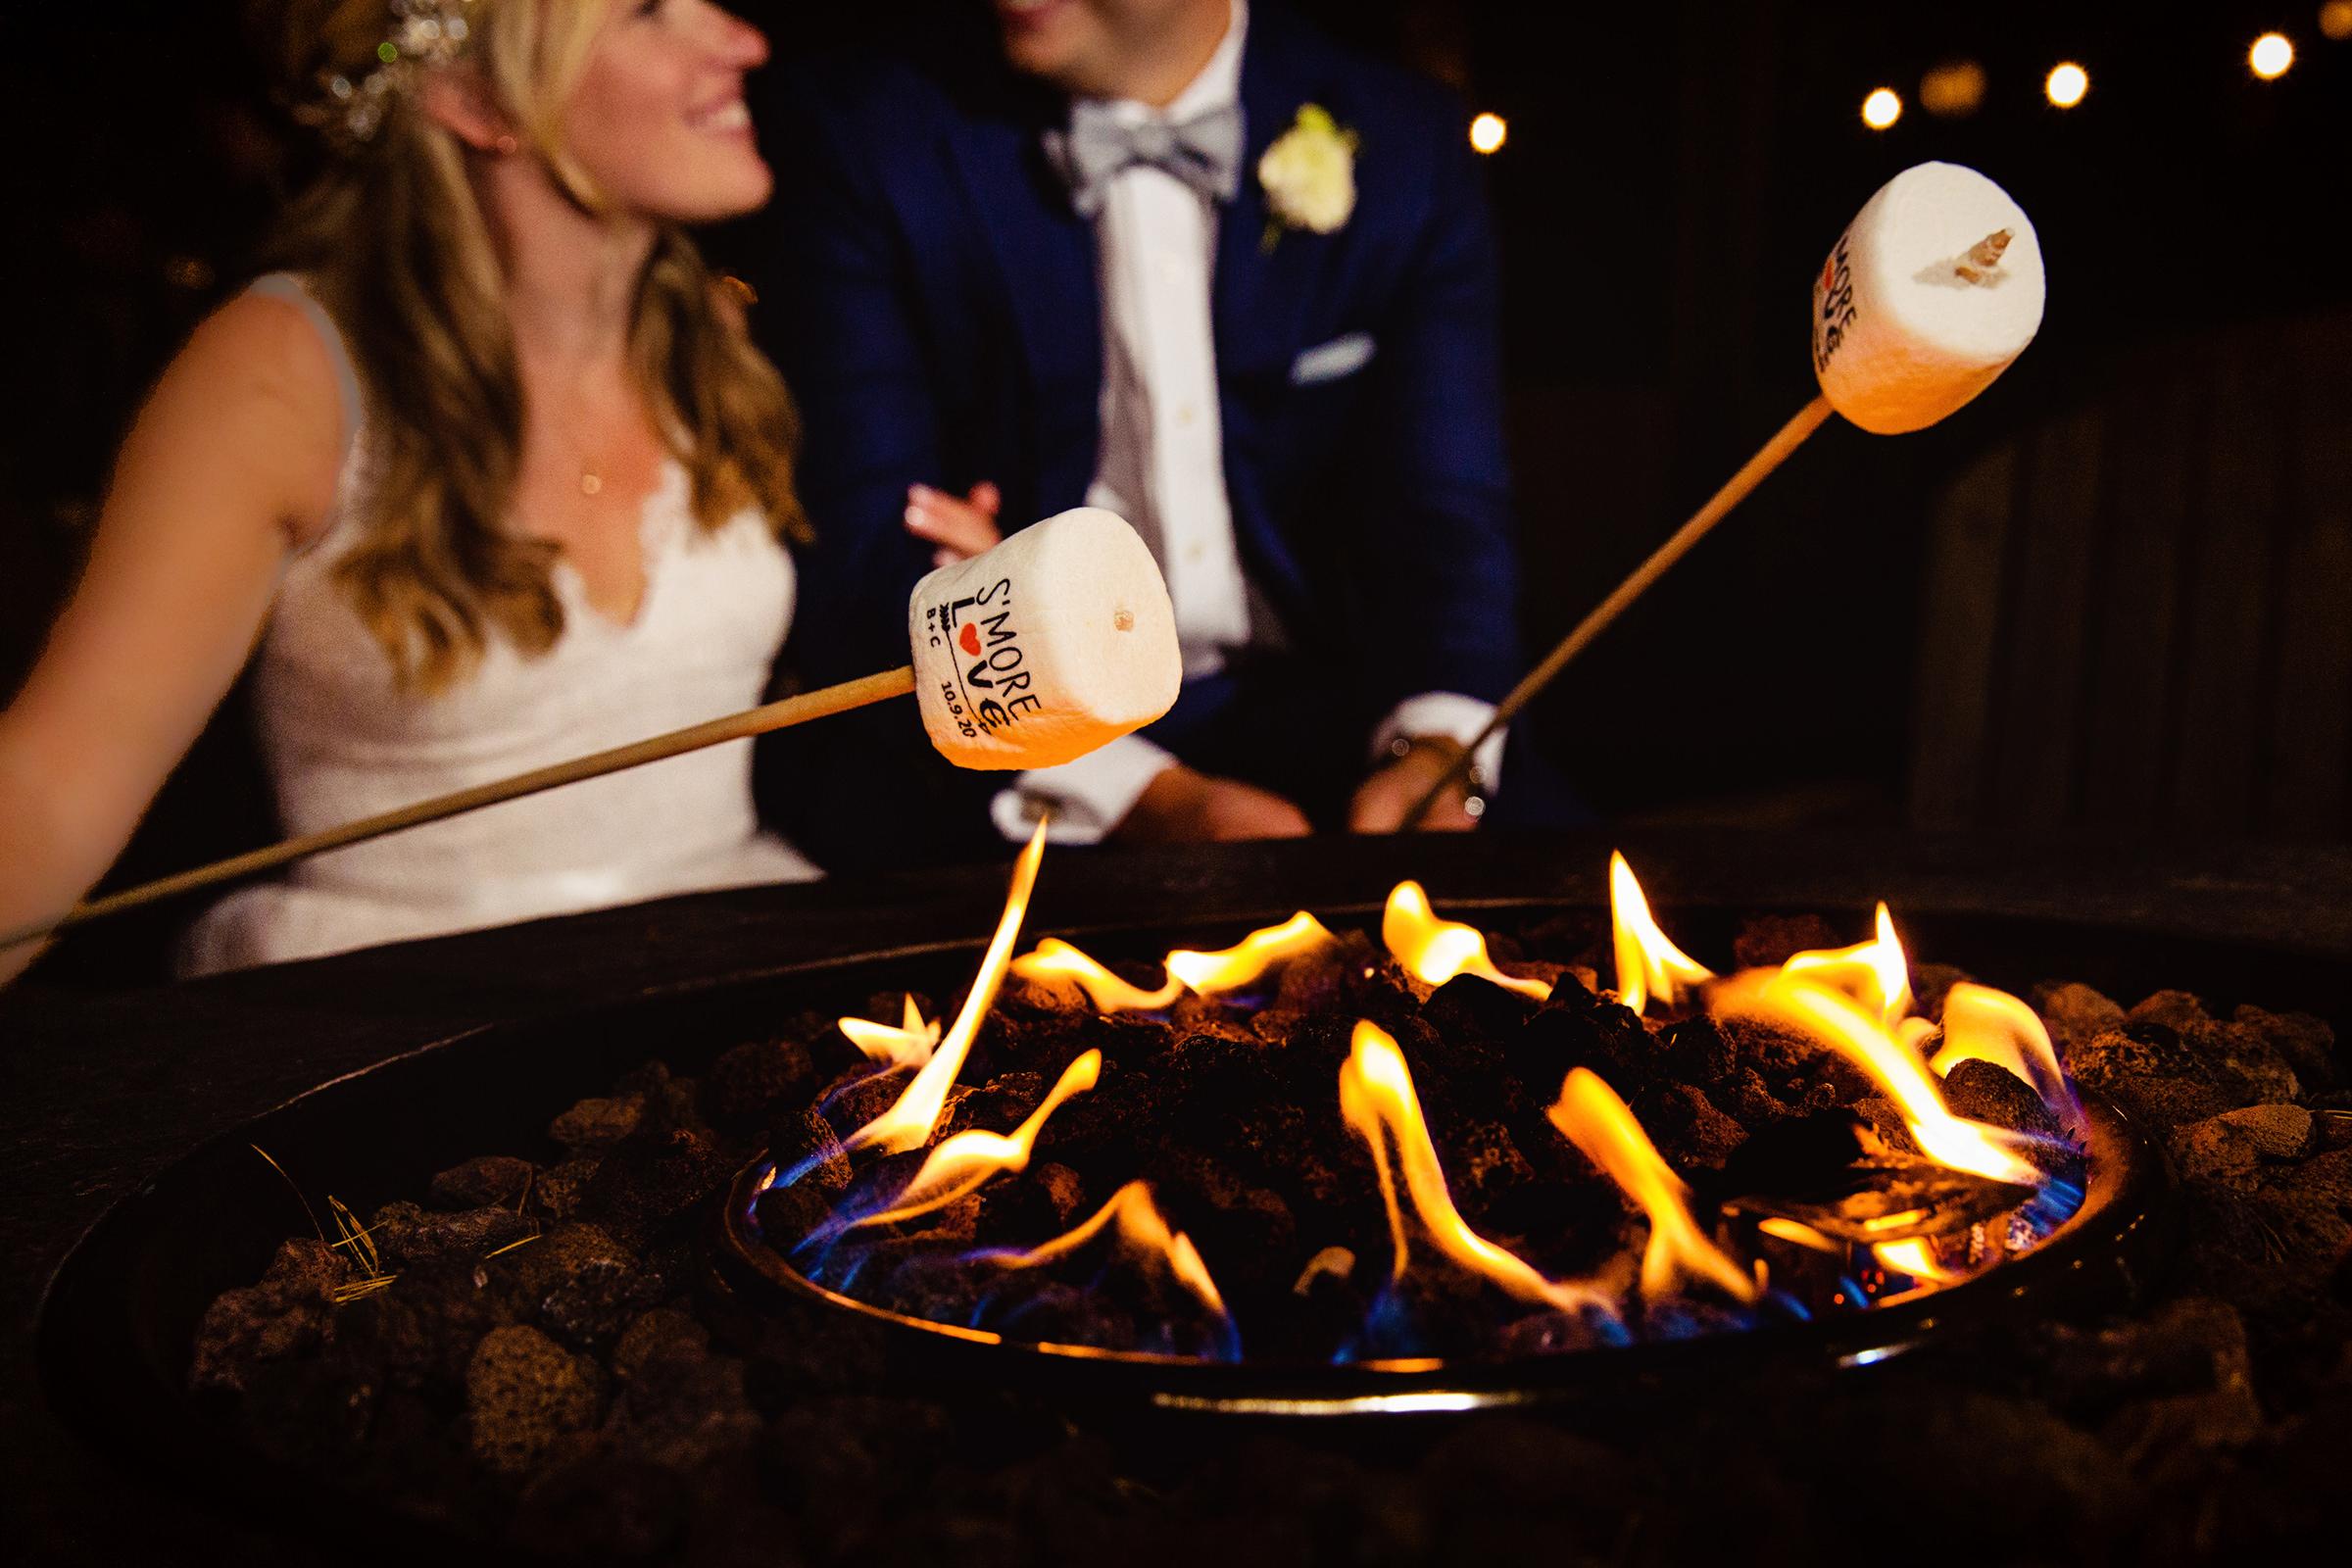 couple-roasting-marshmallows-rayan-anastor-photography